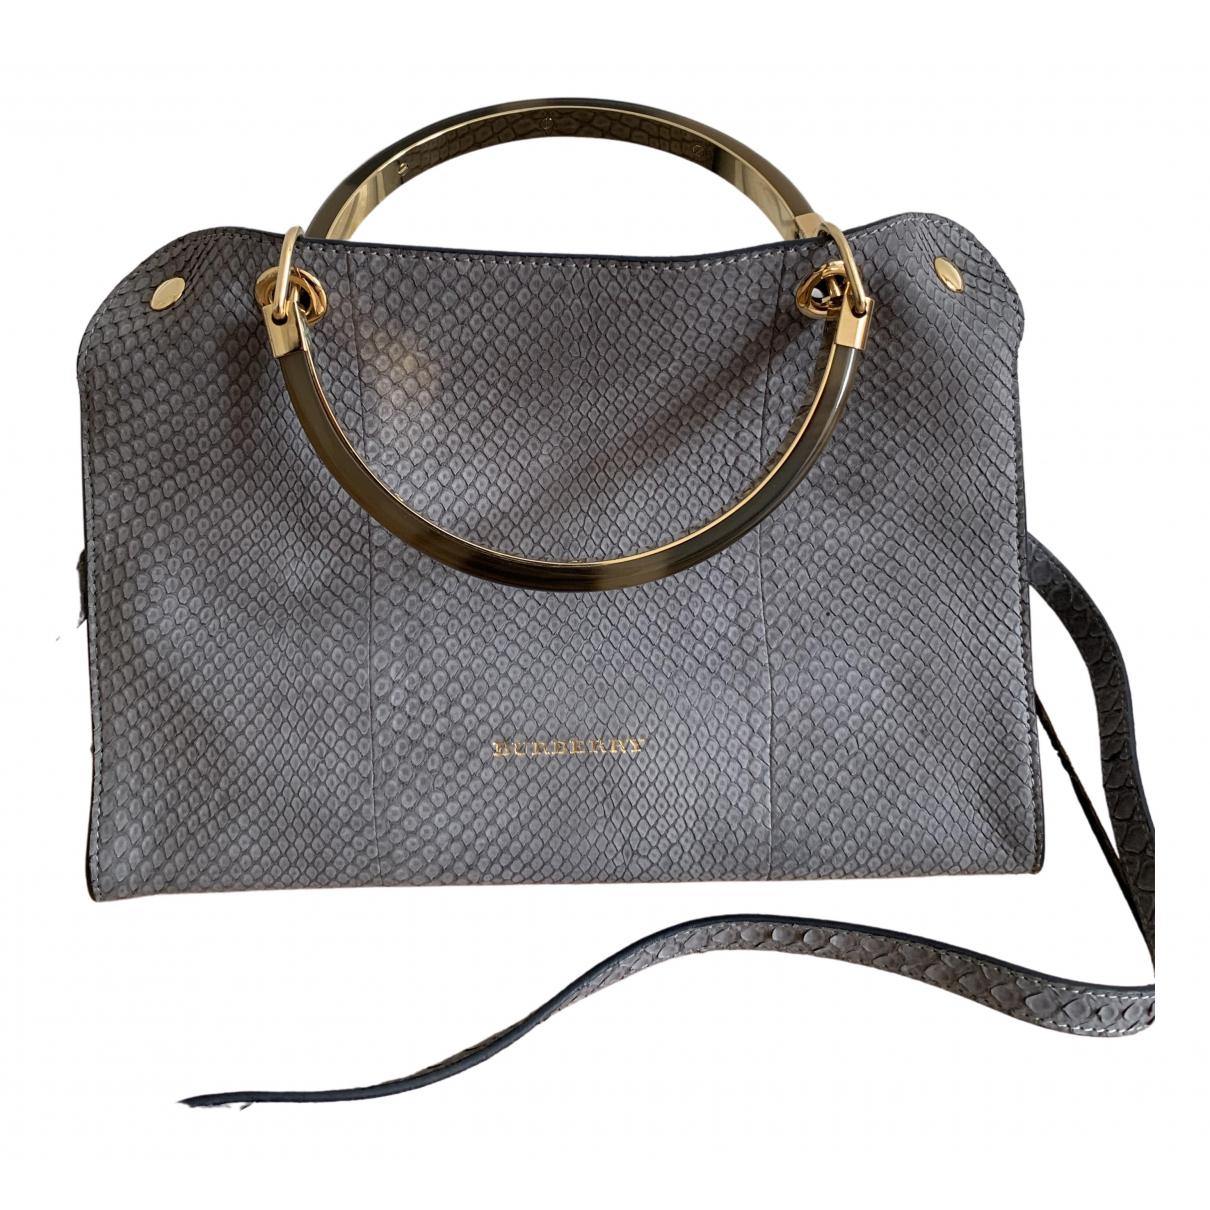 Burberry \N Blue Python handbag for Women \N